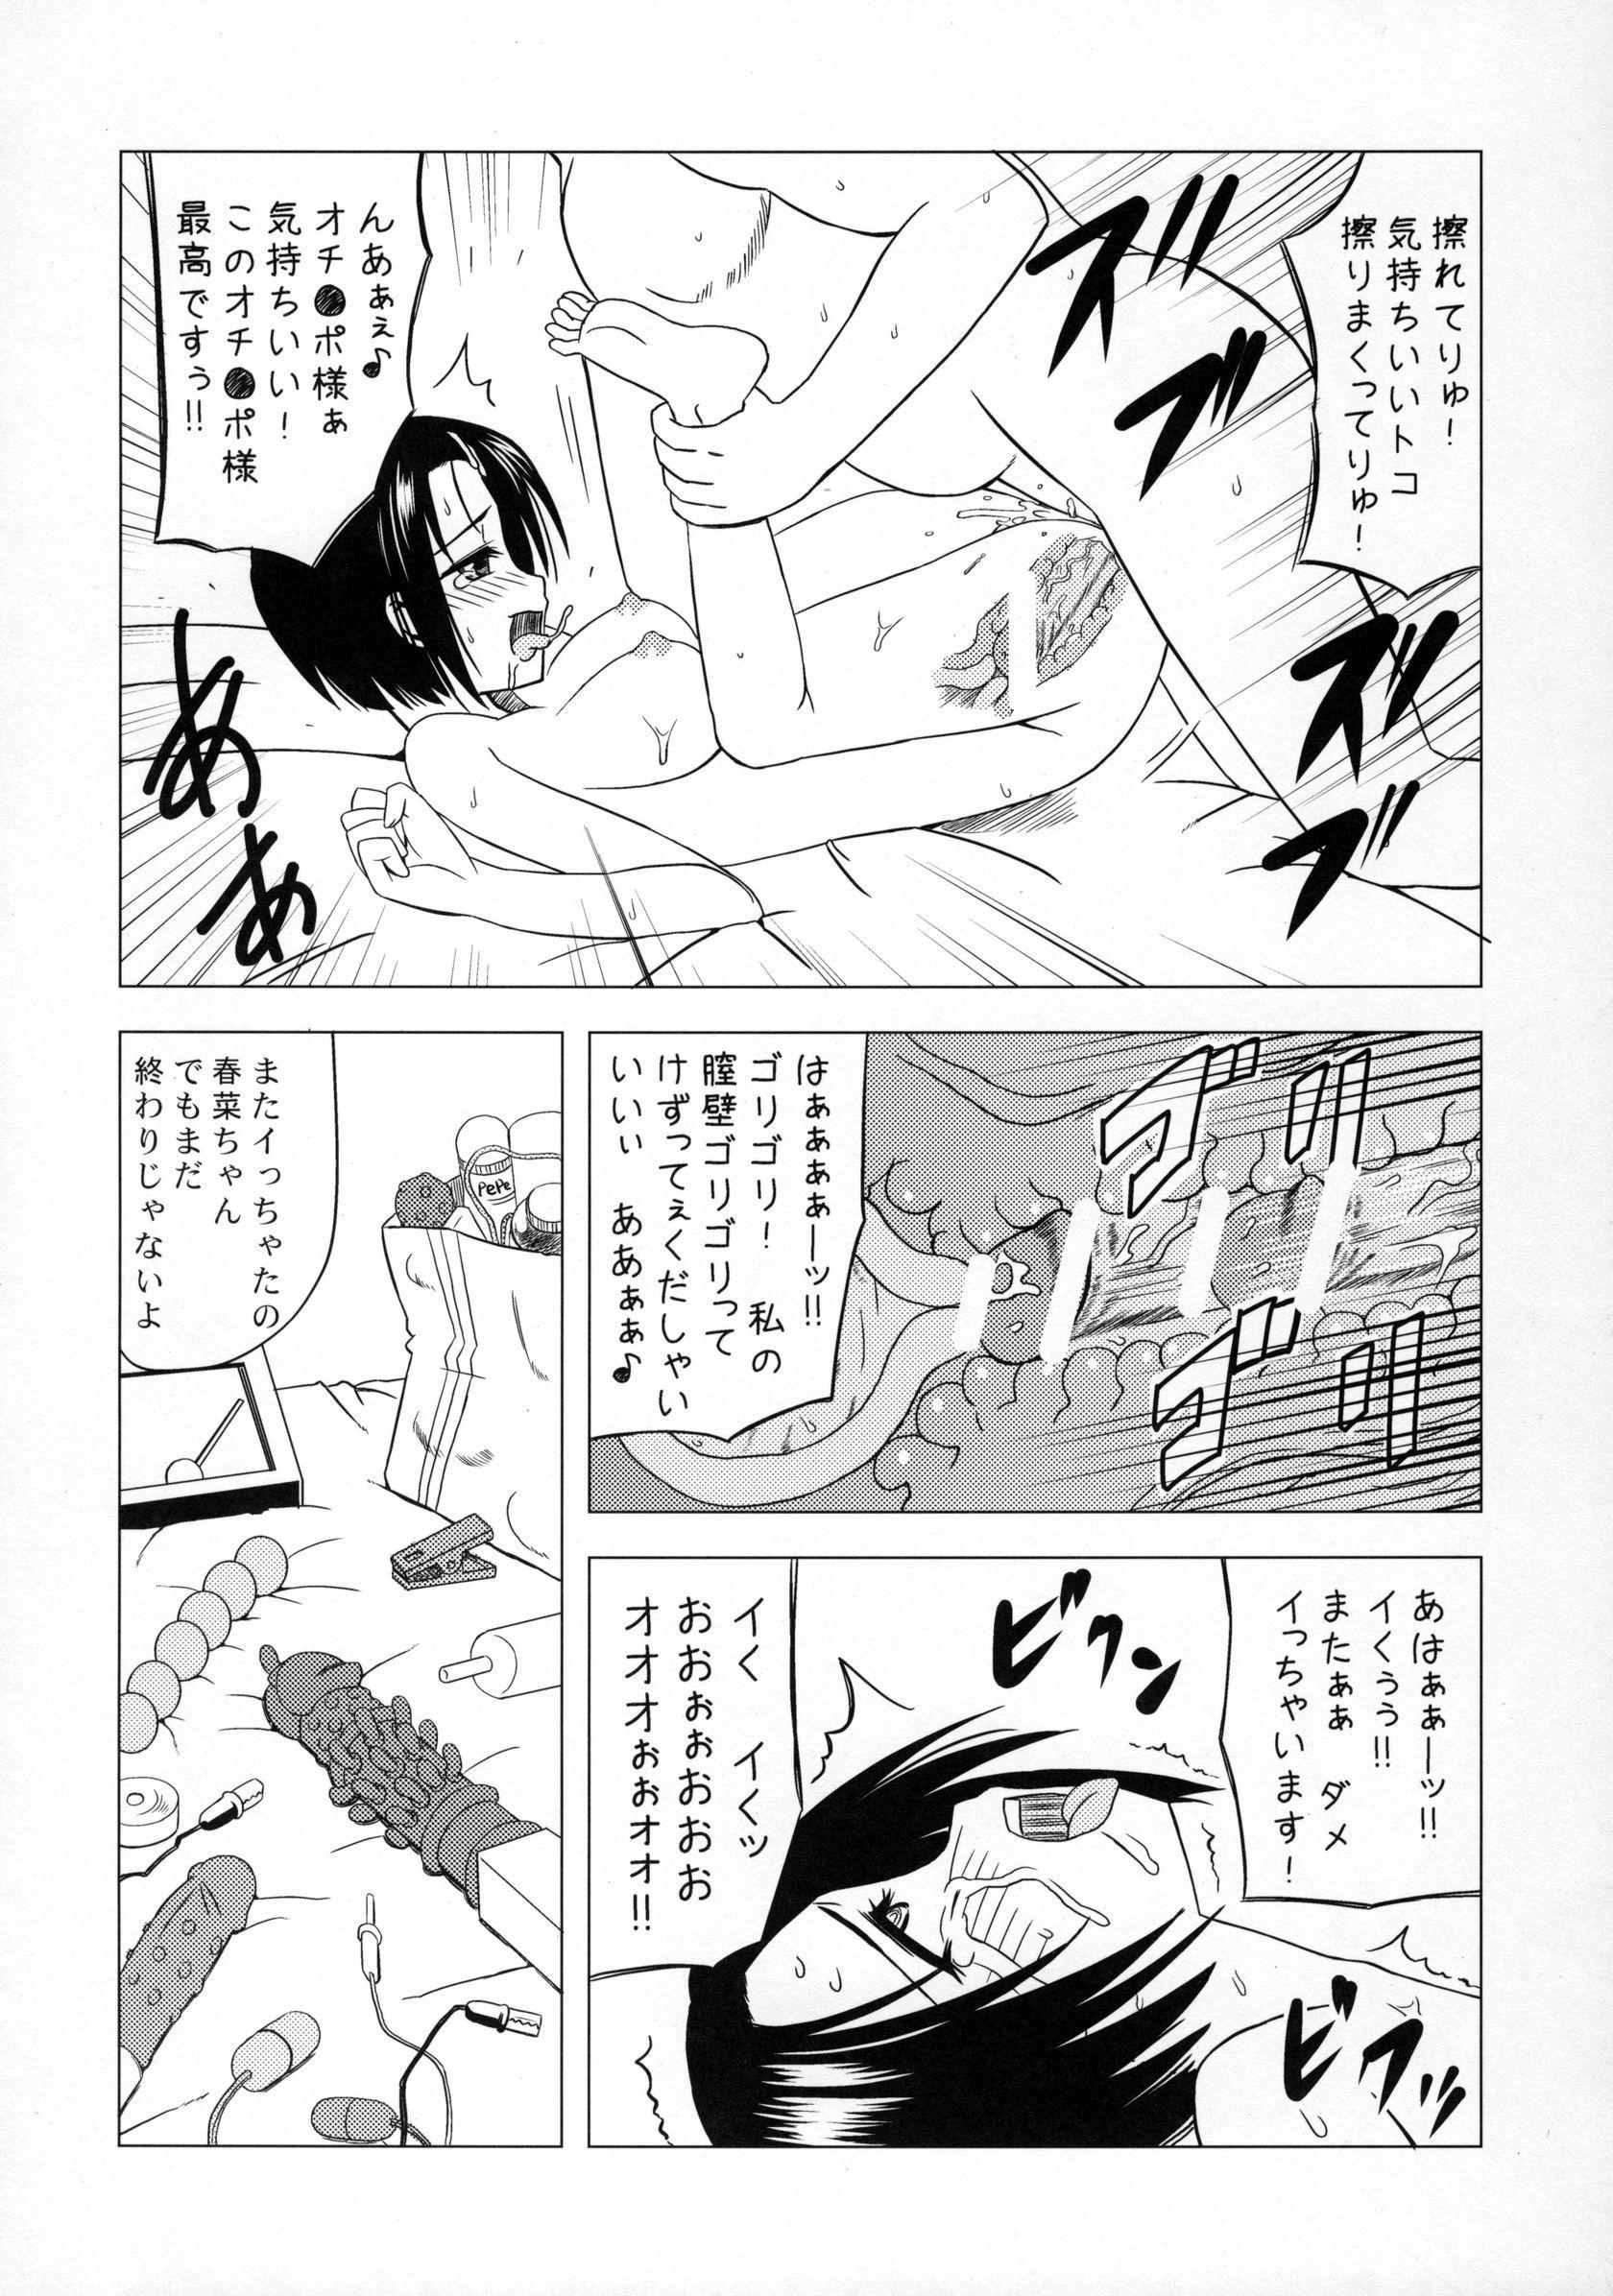 Shinsei M-jou Haruna Inyoku Acme Trouble 19